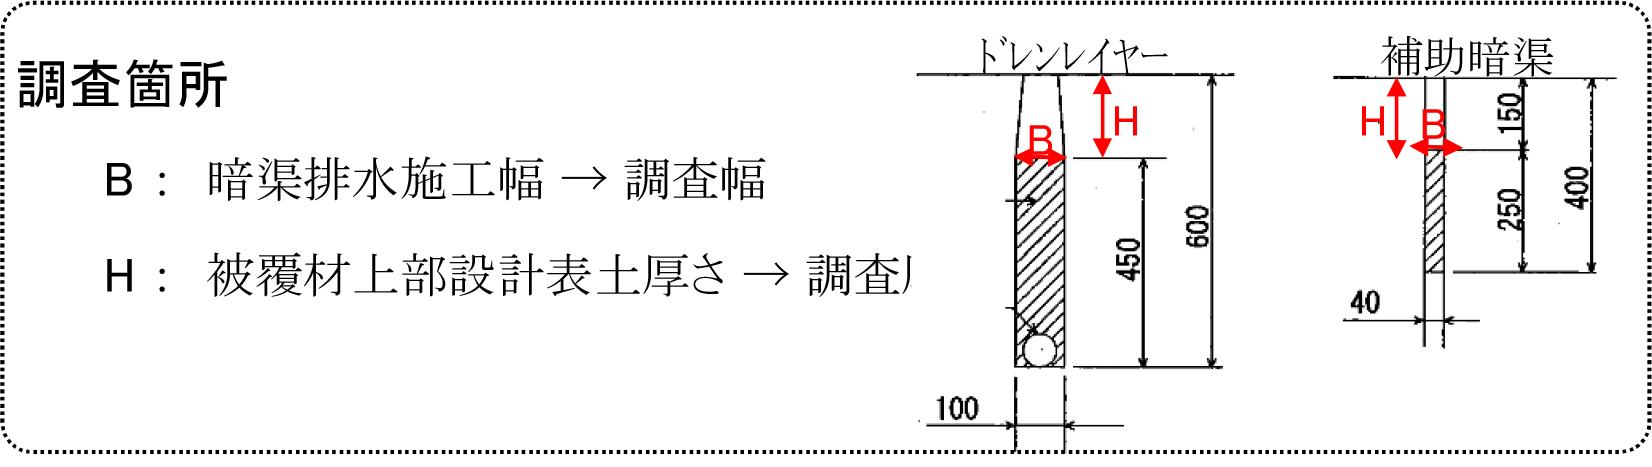 INKkouhouCIMG01